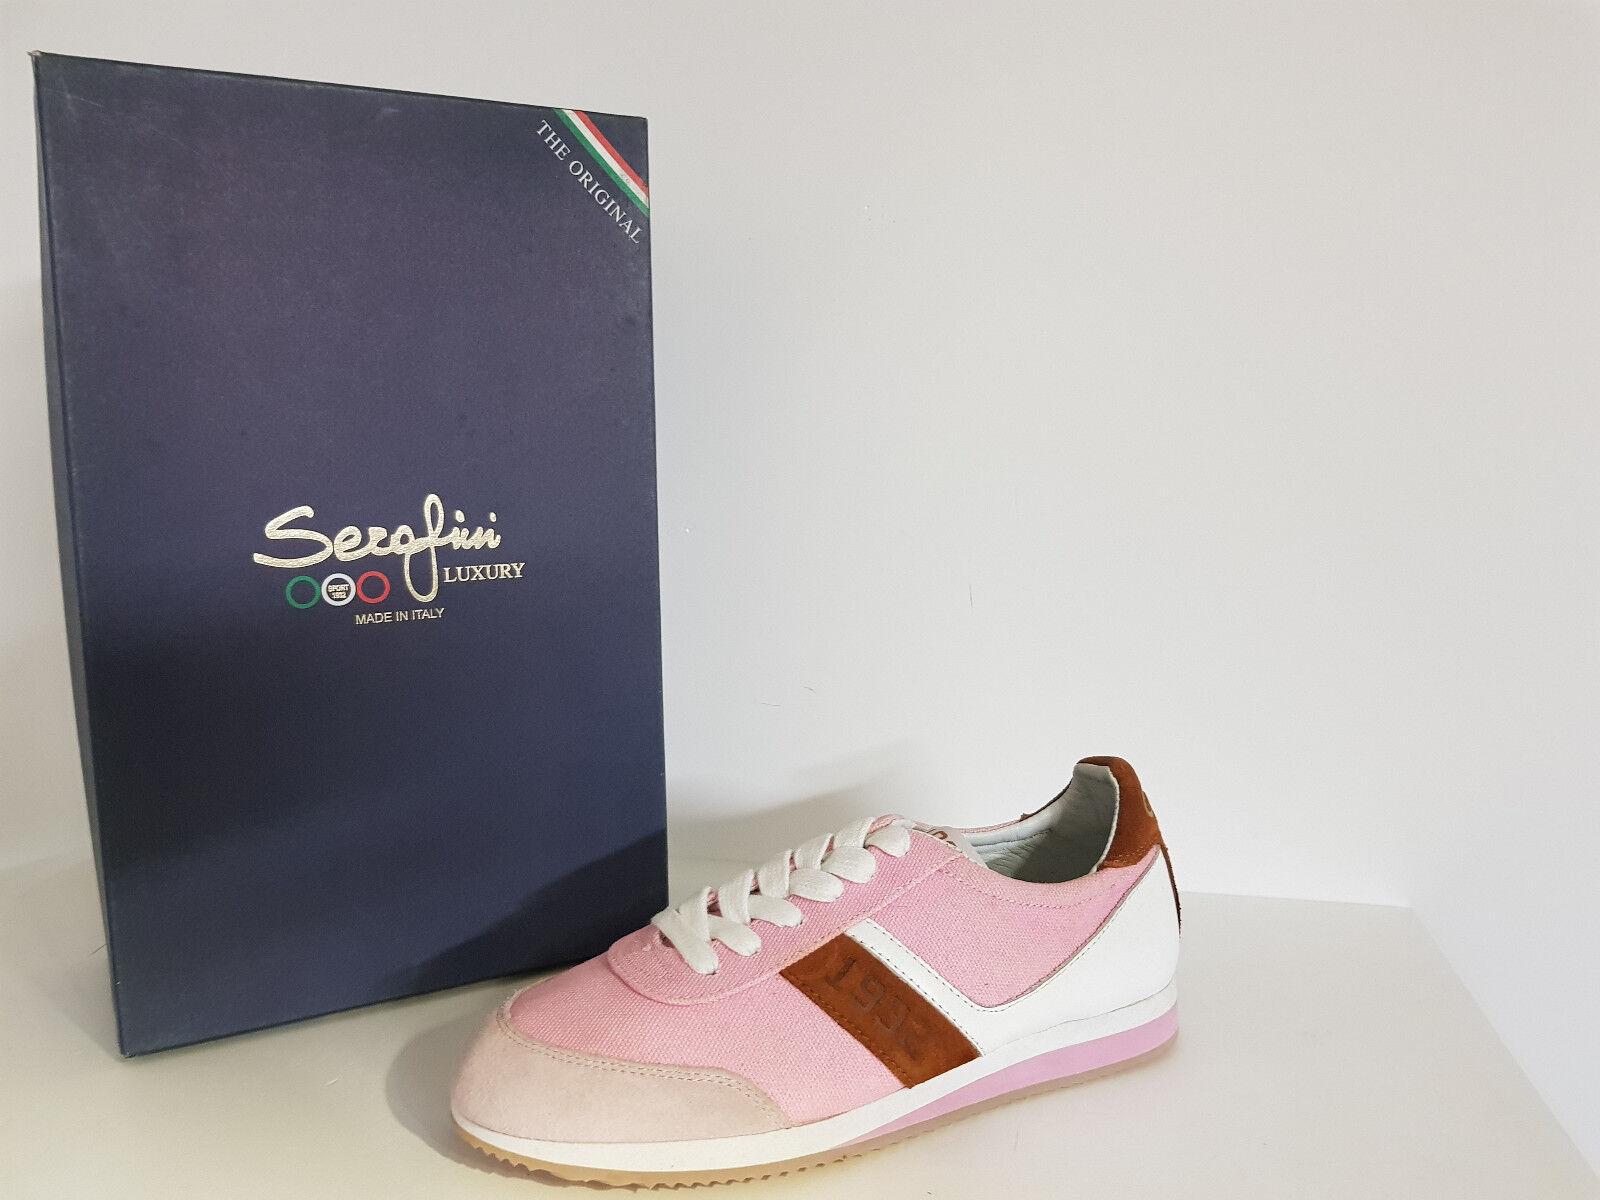 Serafini   Woman Sneakers discount. -75 % Art 1932 Luxury - Col. pink